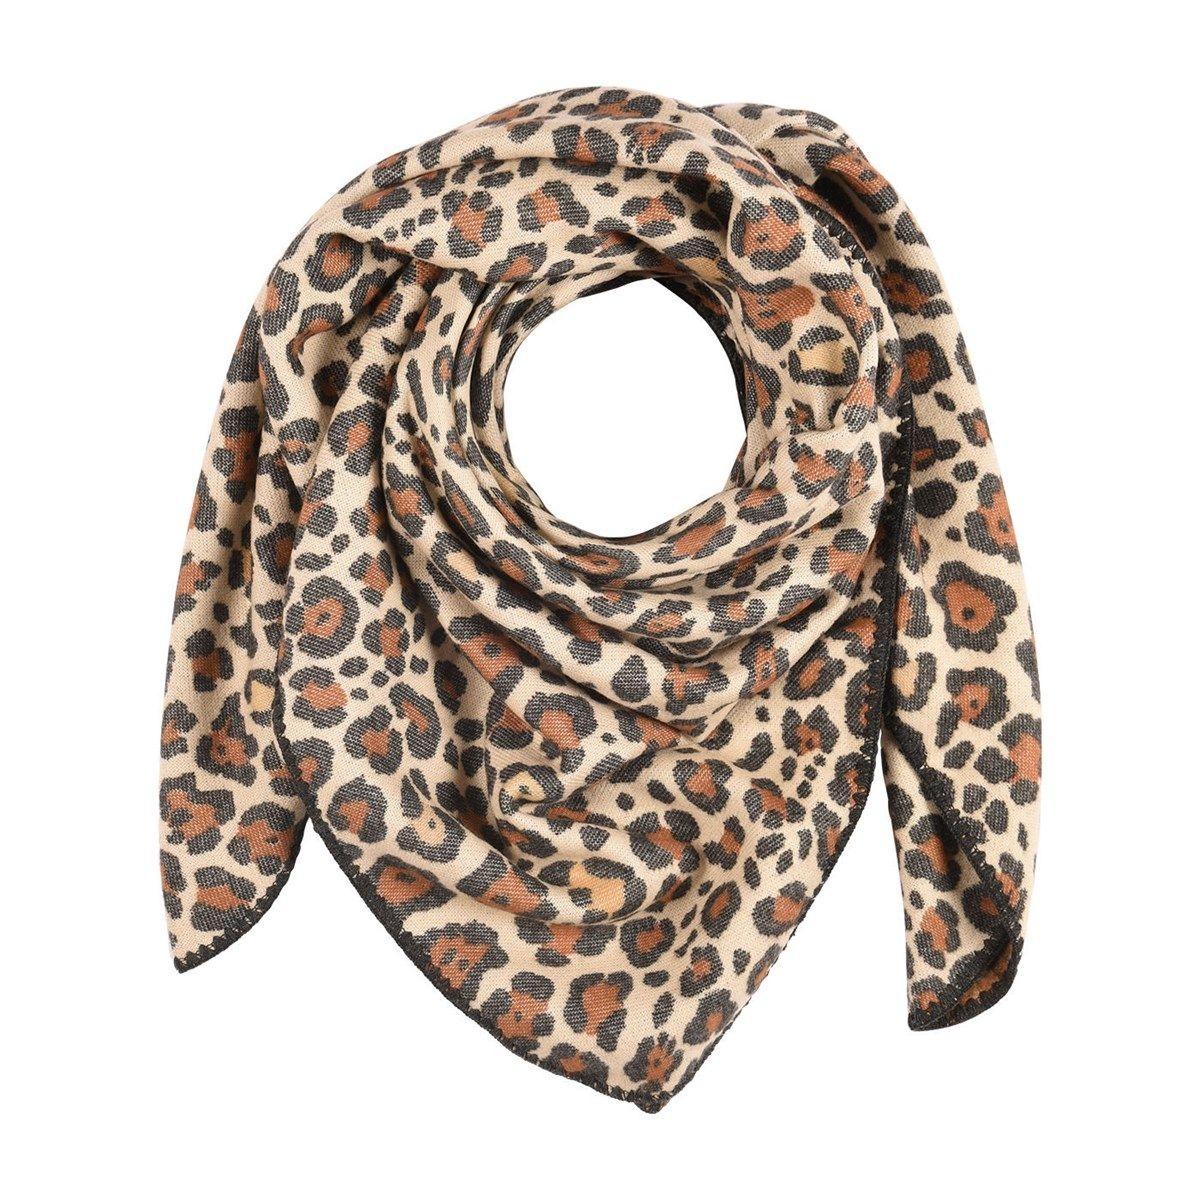 Foulard plaid léopard Made in France